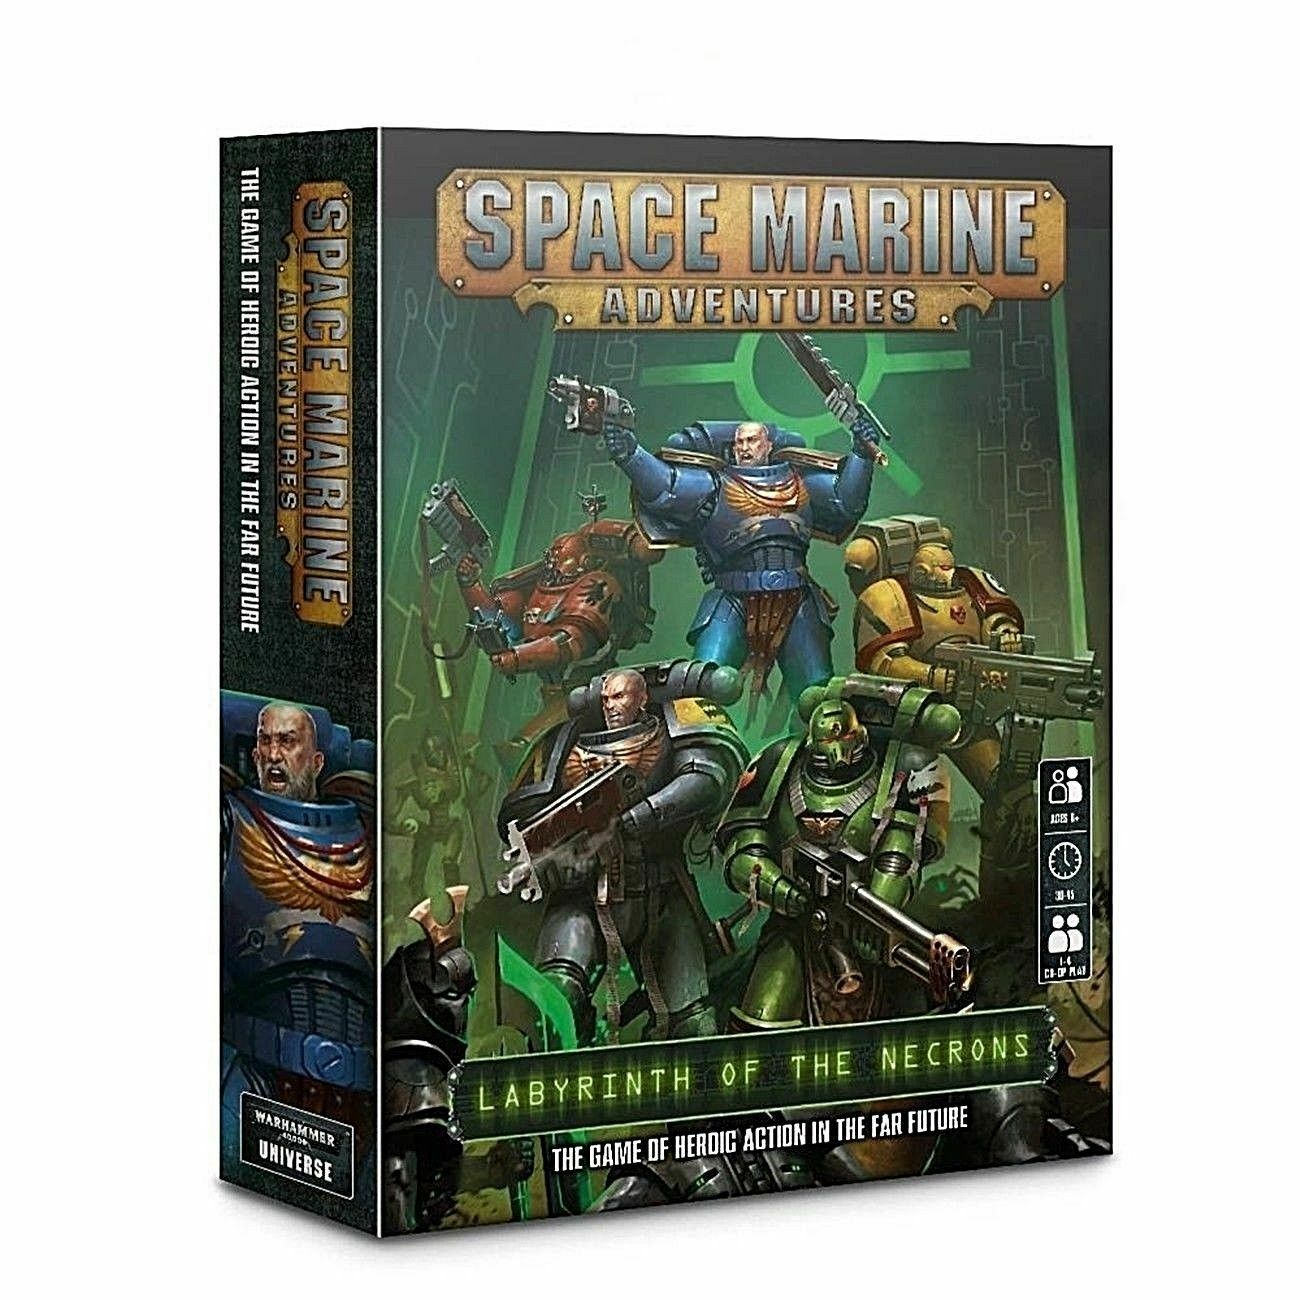 Space Marine warhammer 40k aventures  Labyrinthe de la NECRON BOARD GAME NEUF  sortie de marque